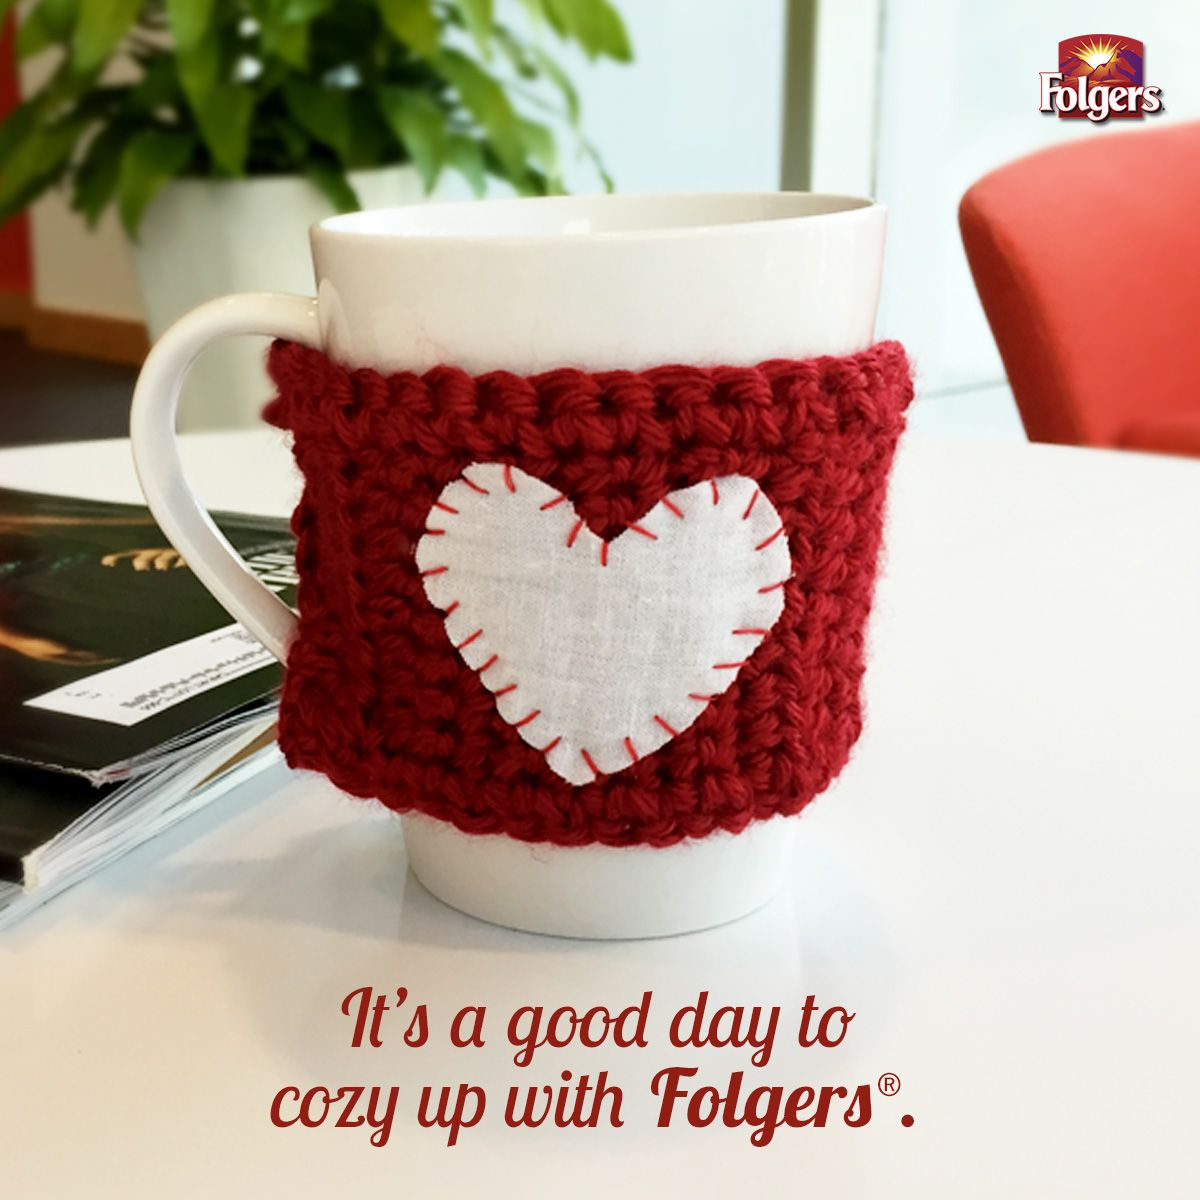 I Love This Crocheted Coffee Cup Koozie Amanda Adams D Things